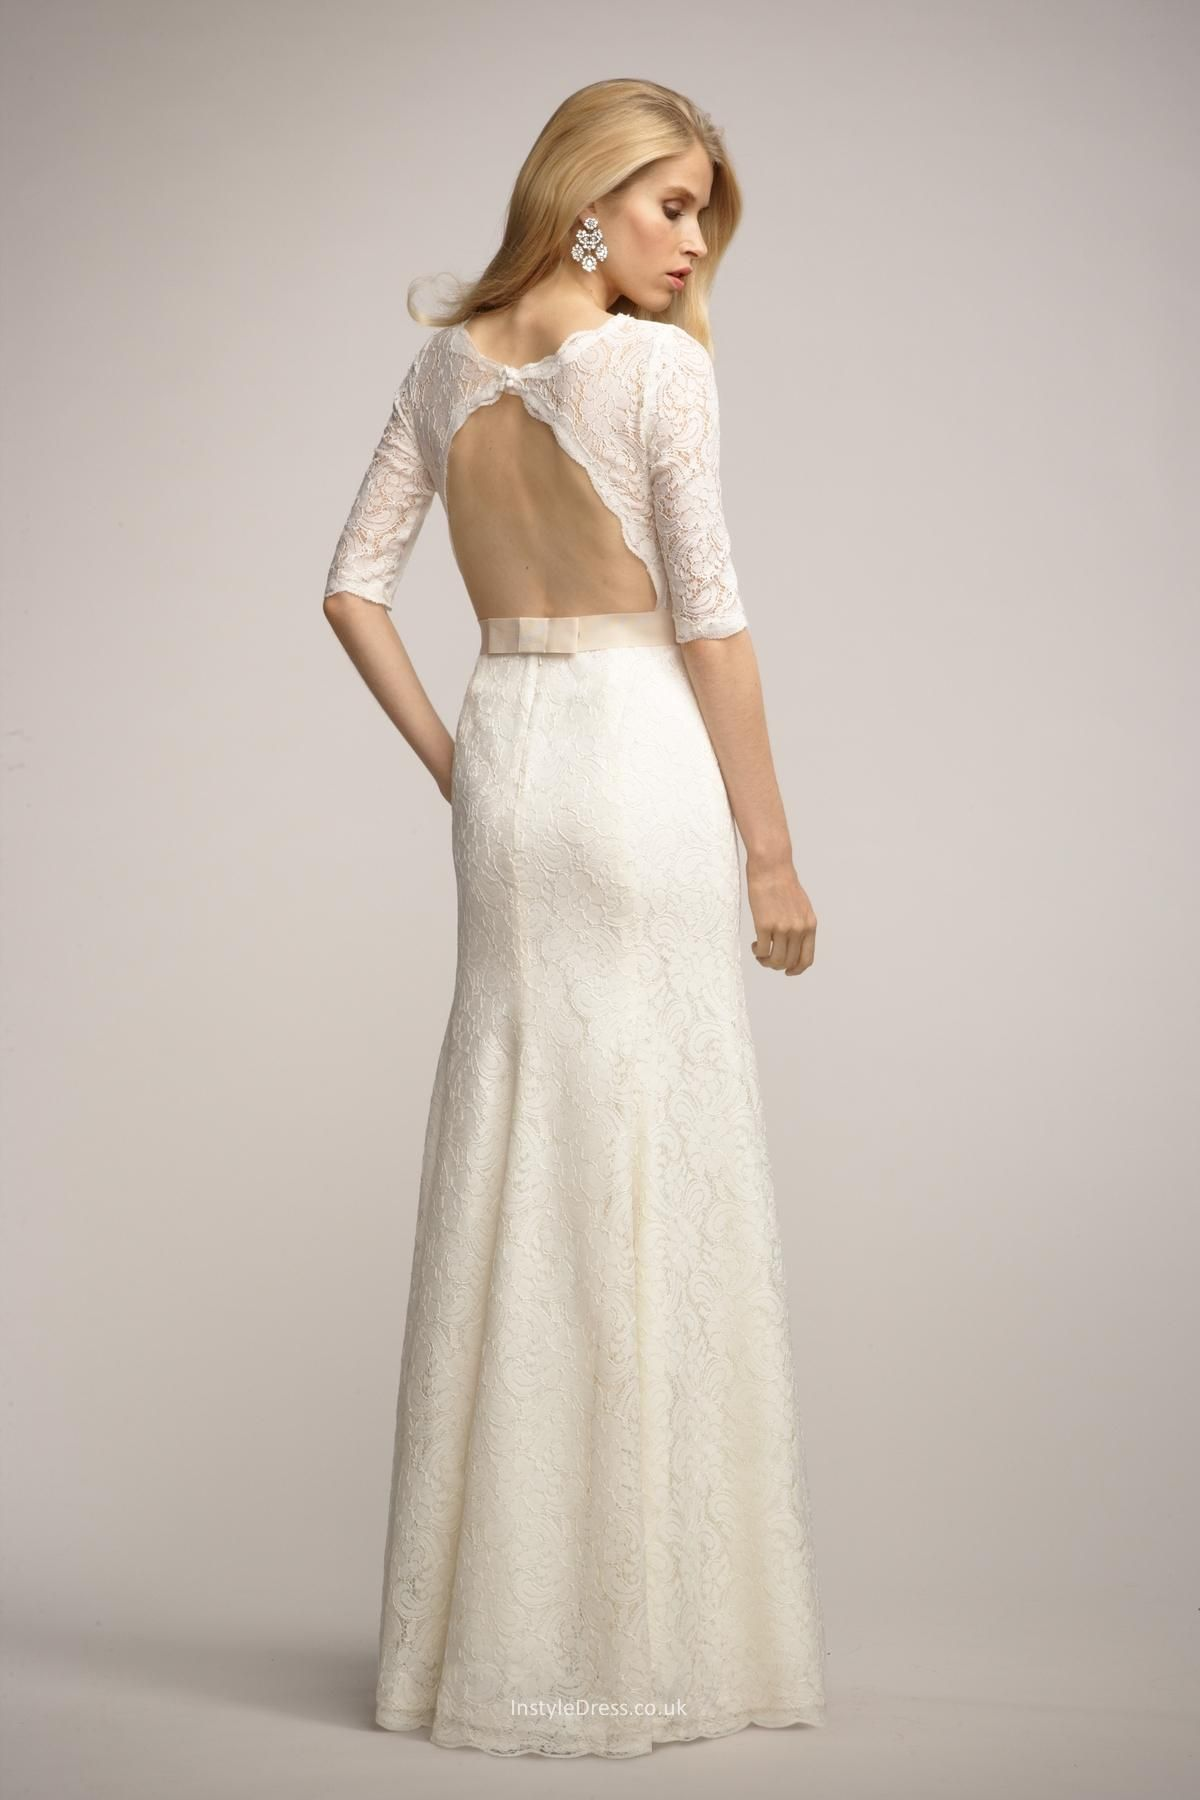 3 4 sleeve lace wedding dress  Blue dress   sleeve ivory lace dress  My Fashion dresses